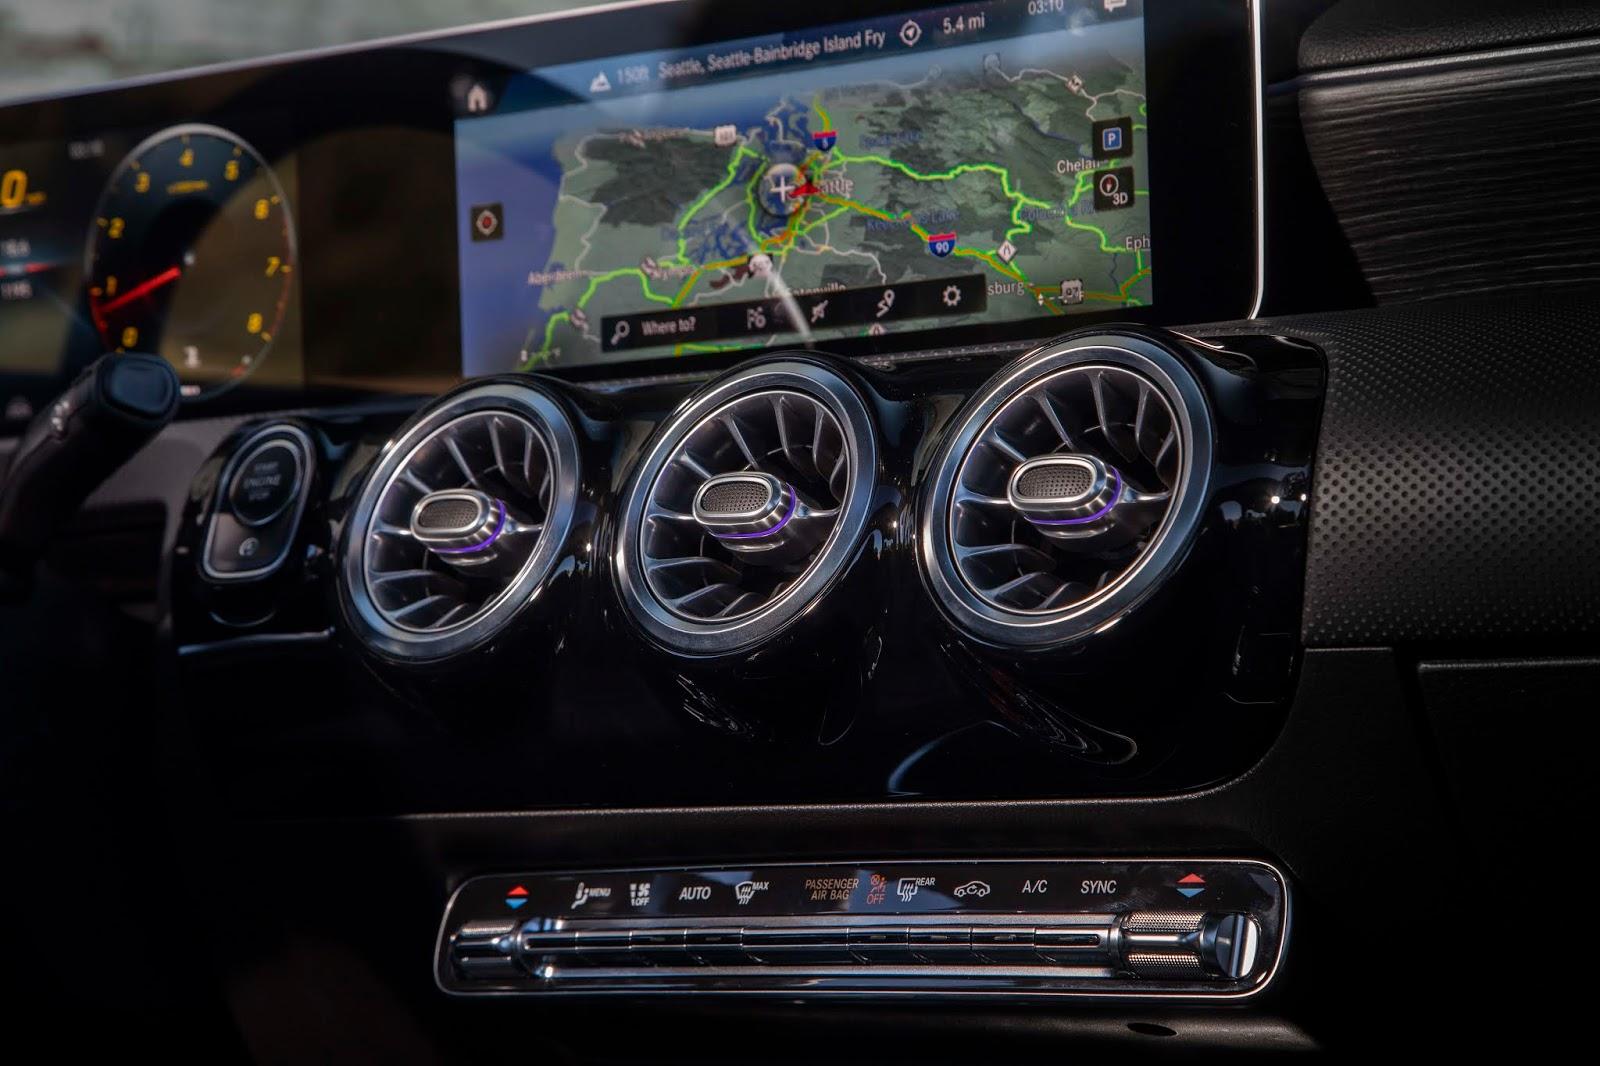 18C0776 020 Από 28.230 ευρώ η τιμή της Mercedes A-Class Sedan Luxury sedan, Mercedes, Mercedes AMG, premium sedan, sedan, zblog, καινούργιο, καινούρια, τιμες